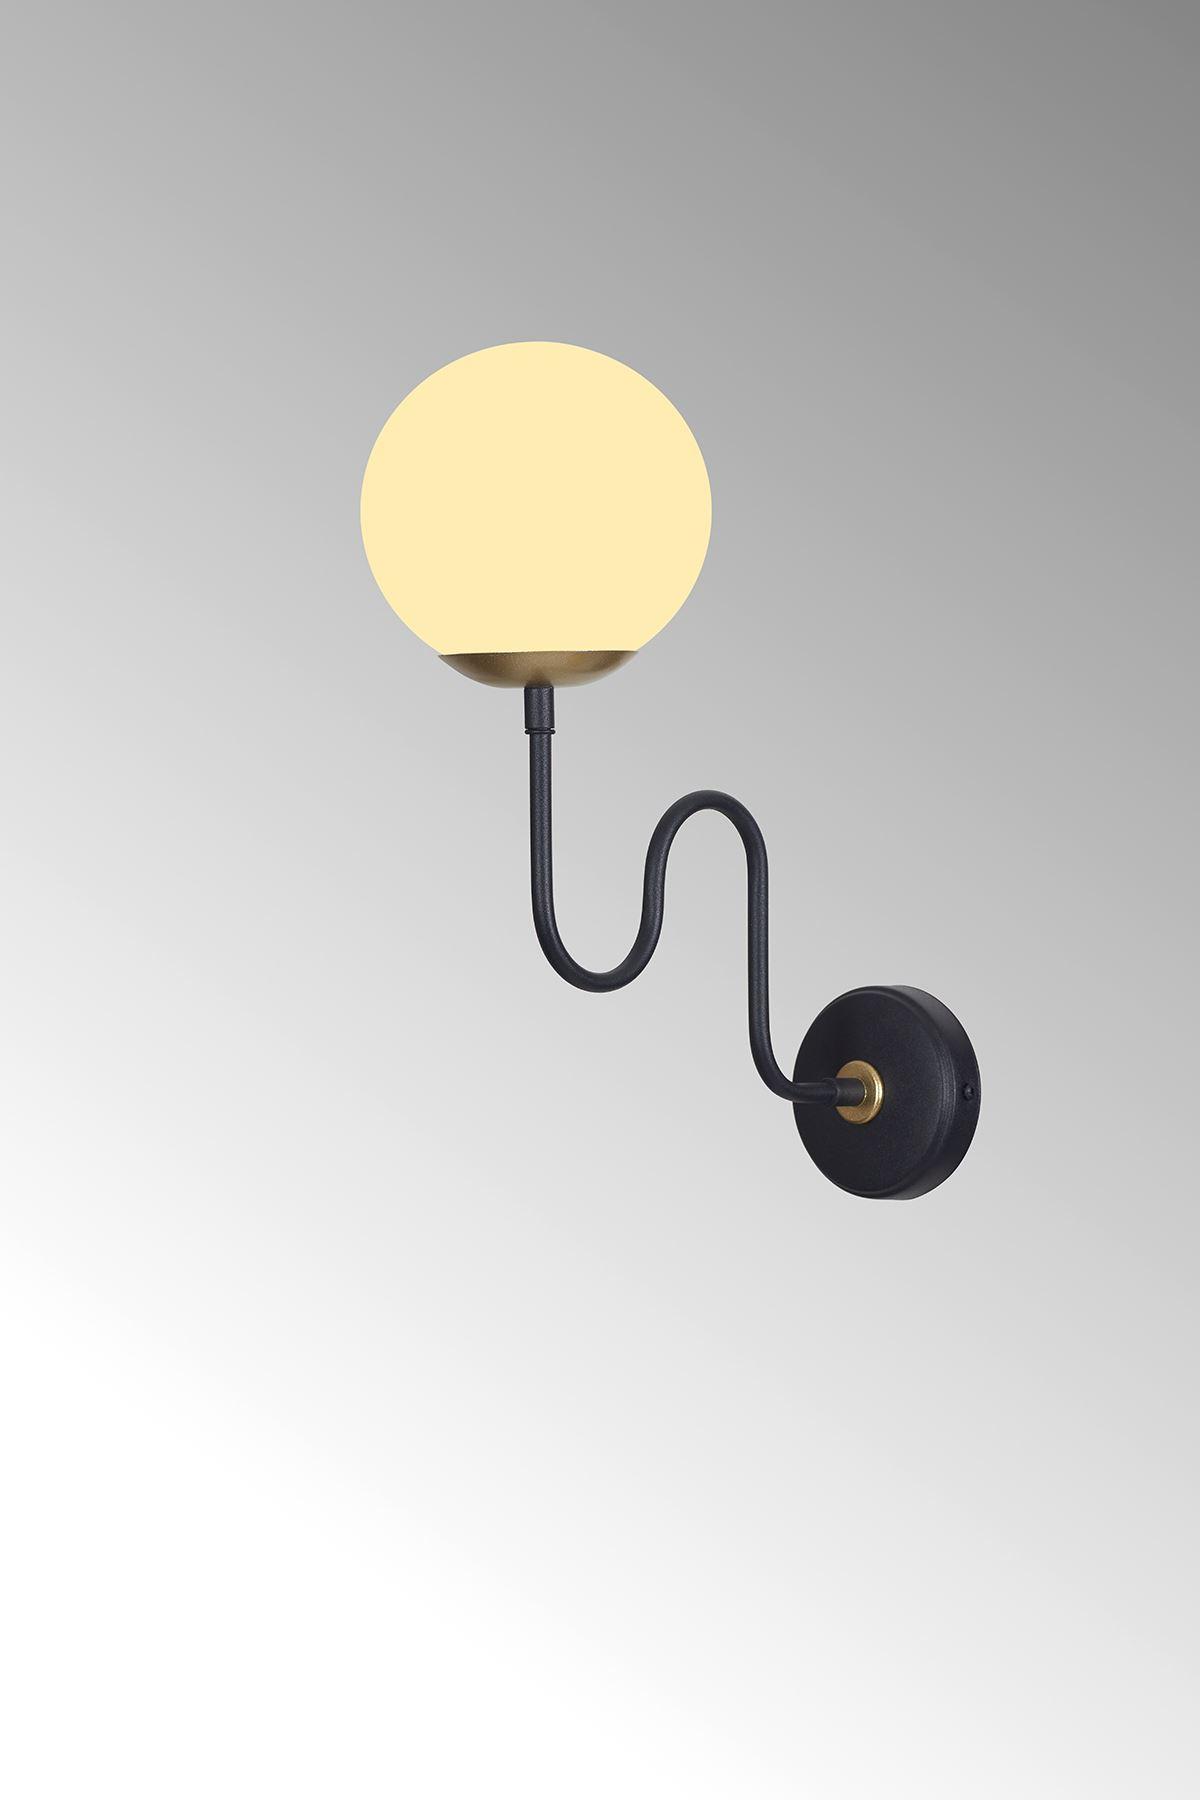 Ferro Dikey Sarı-Siyah Metal Gövde Beyaz Camlı Tasarım Lüx Aplik